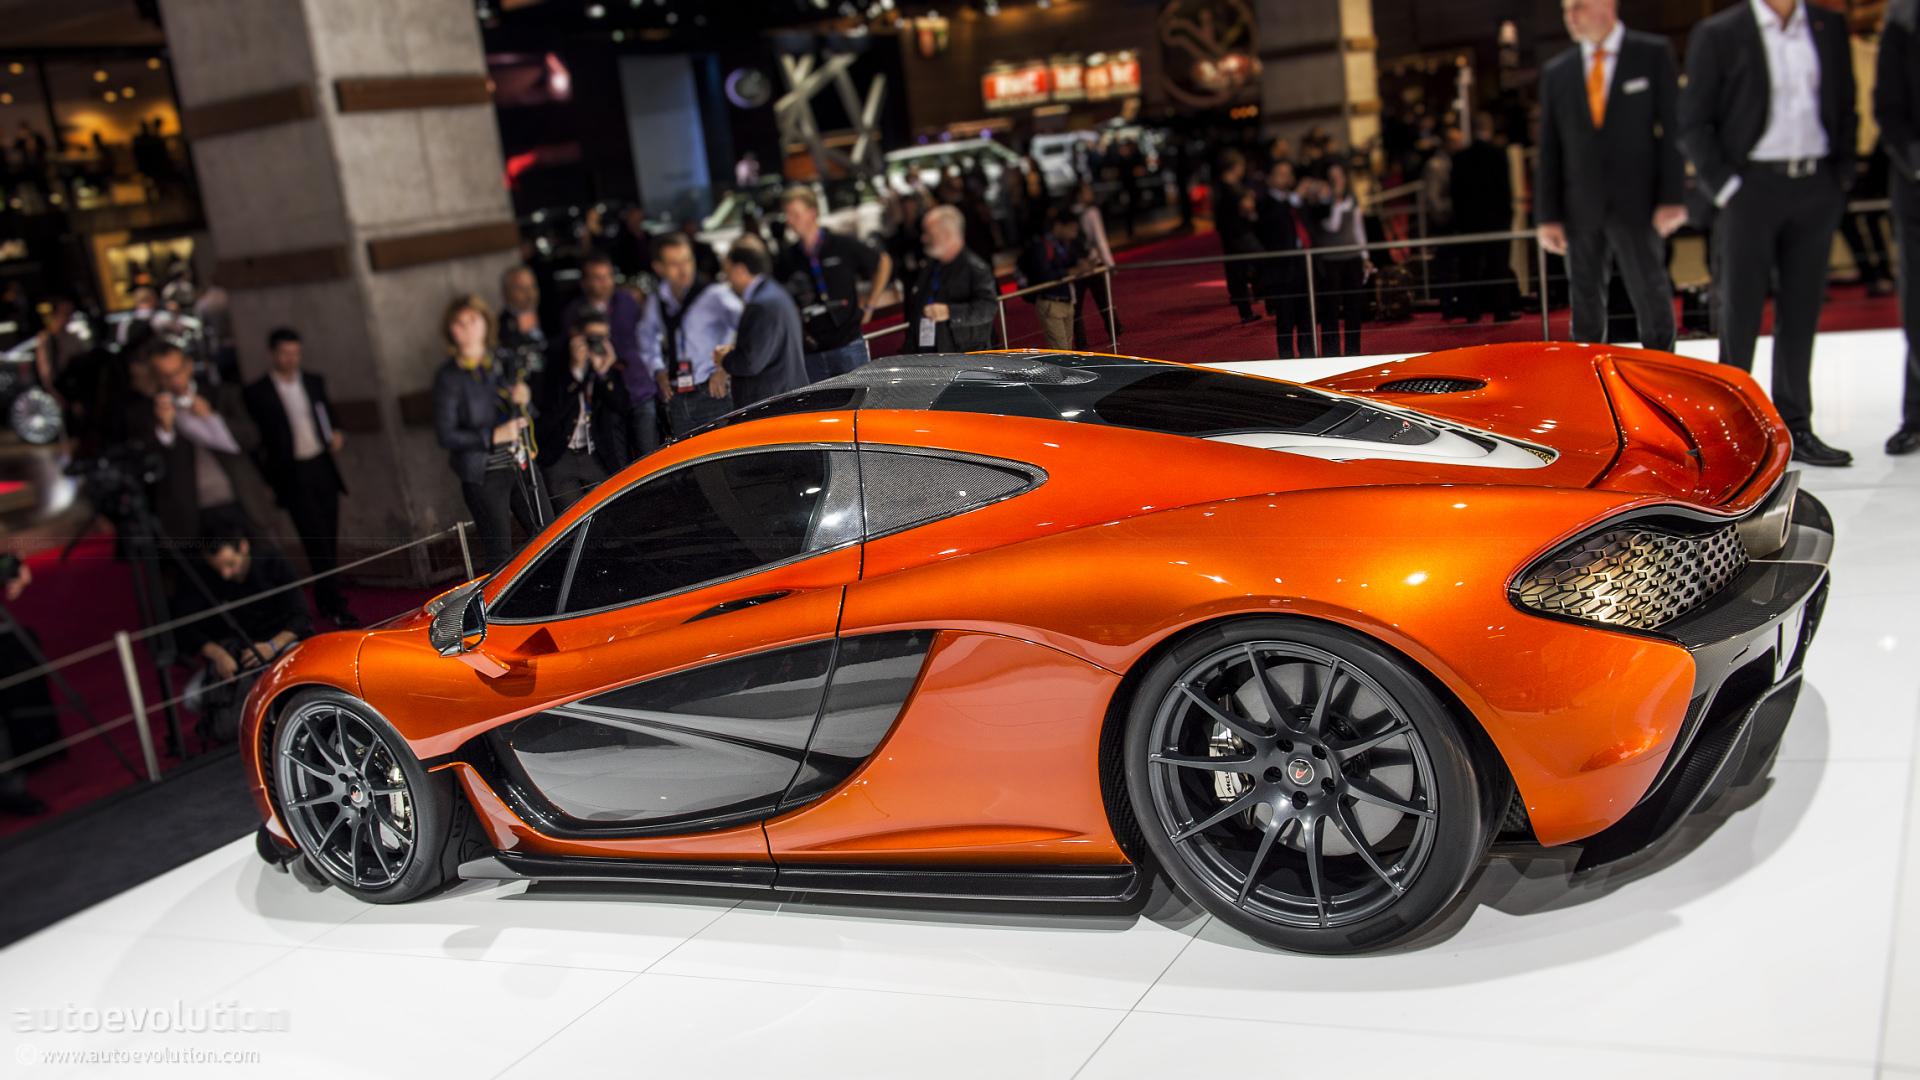 http://s1.cdn.autoevolution.com/images/news/gallery/paris-2012-mclaren-p1-hypercar-concept-live-photos_13.jpg